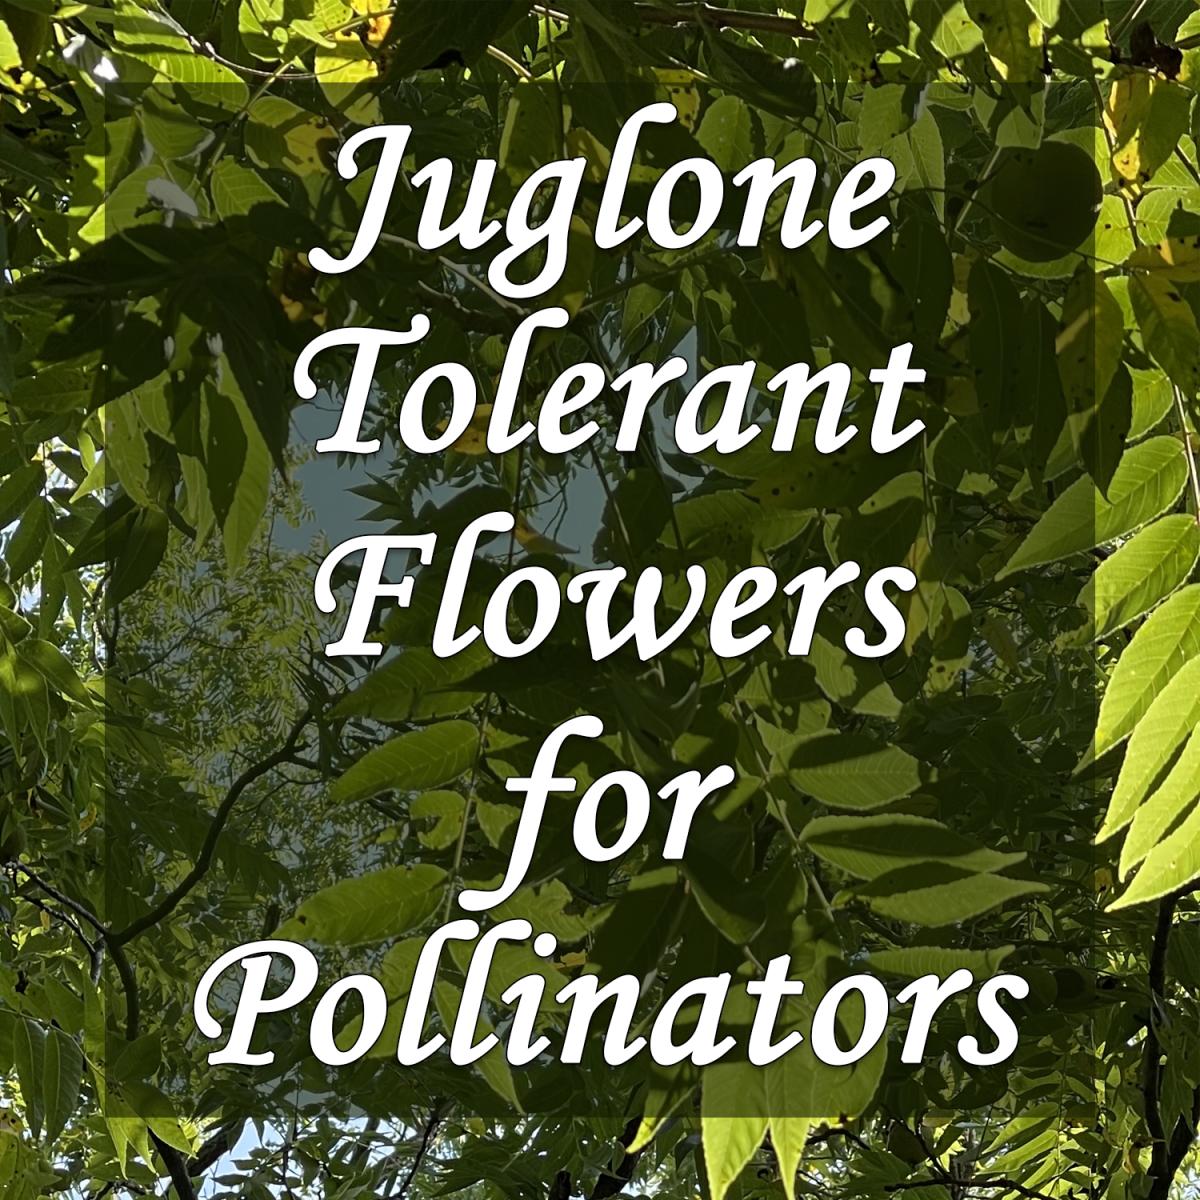 Juglone-Tolerant Flowers That Pollinators Love